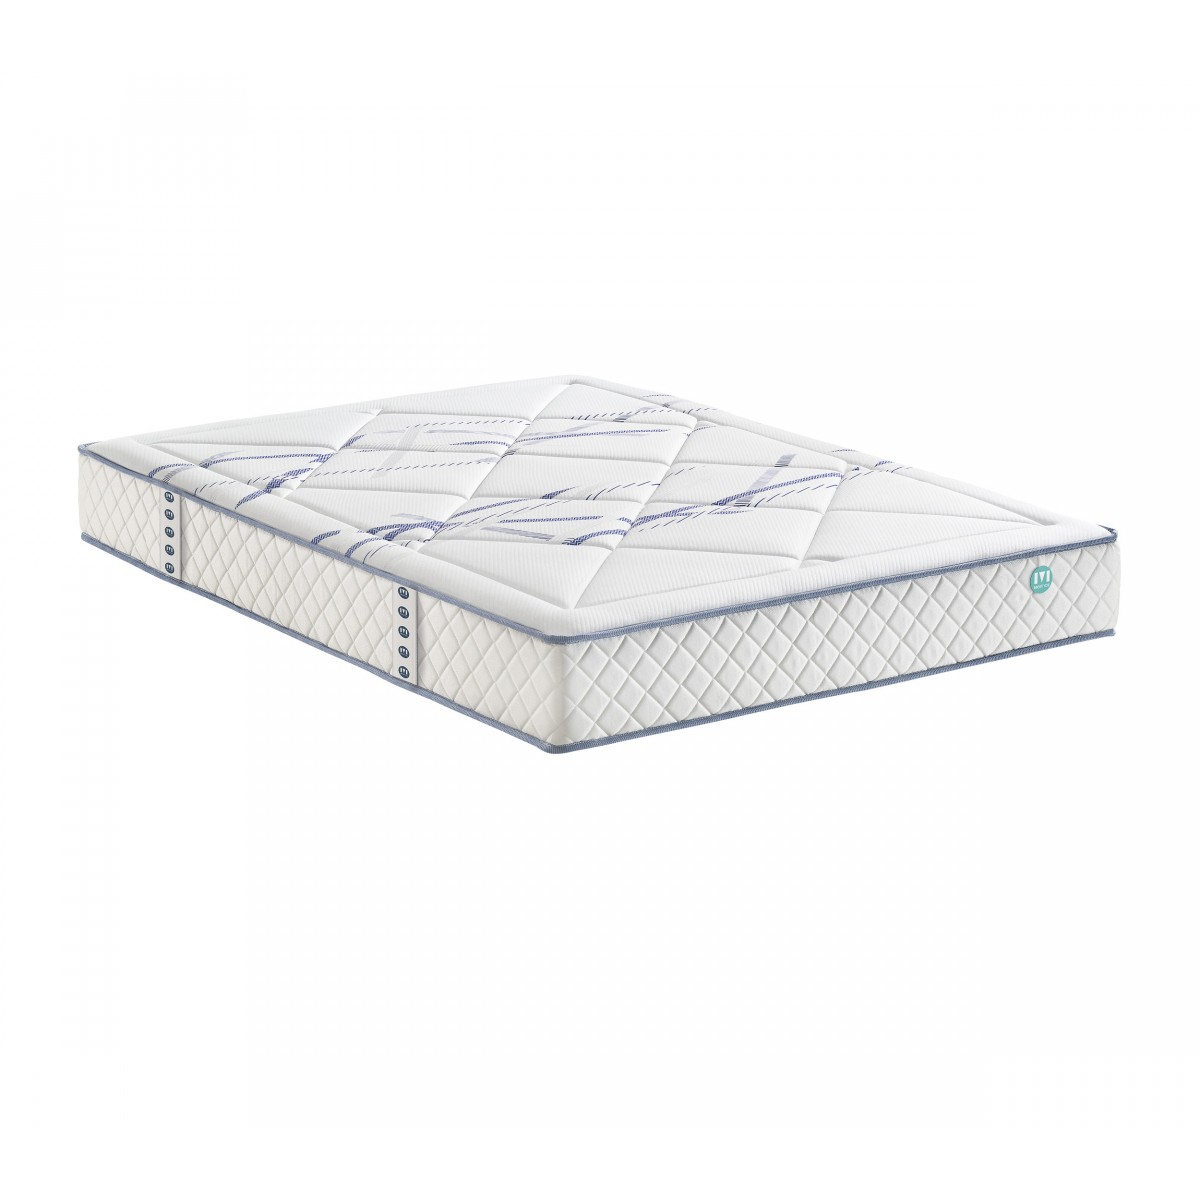 merinos c matelas cozea 150x200 ressorts. Black Bedroom Furniture Sets. Home Design Ideas